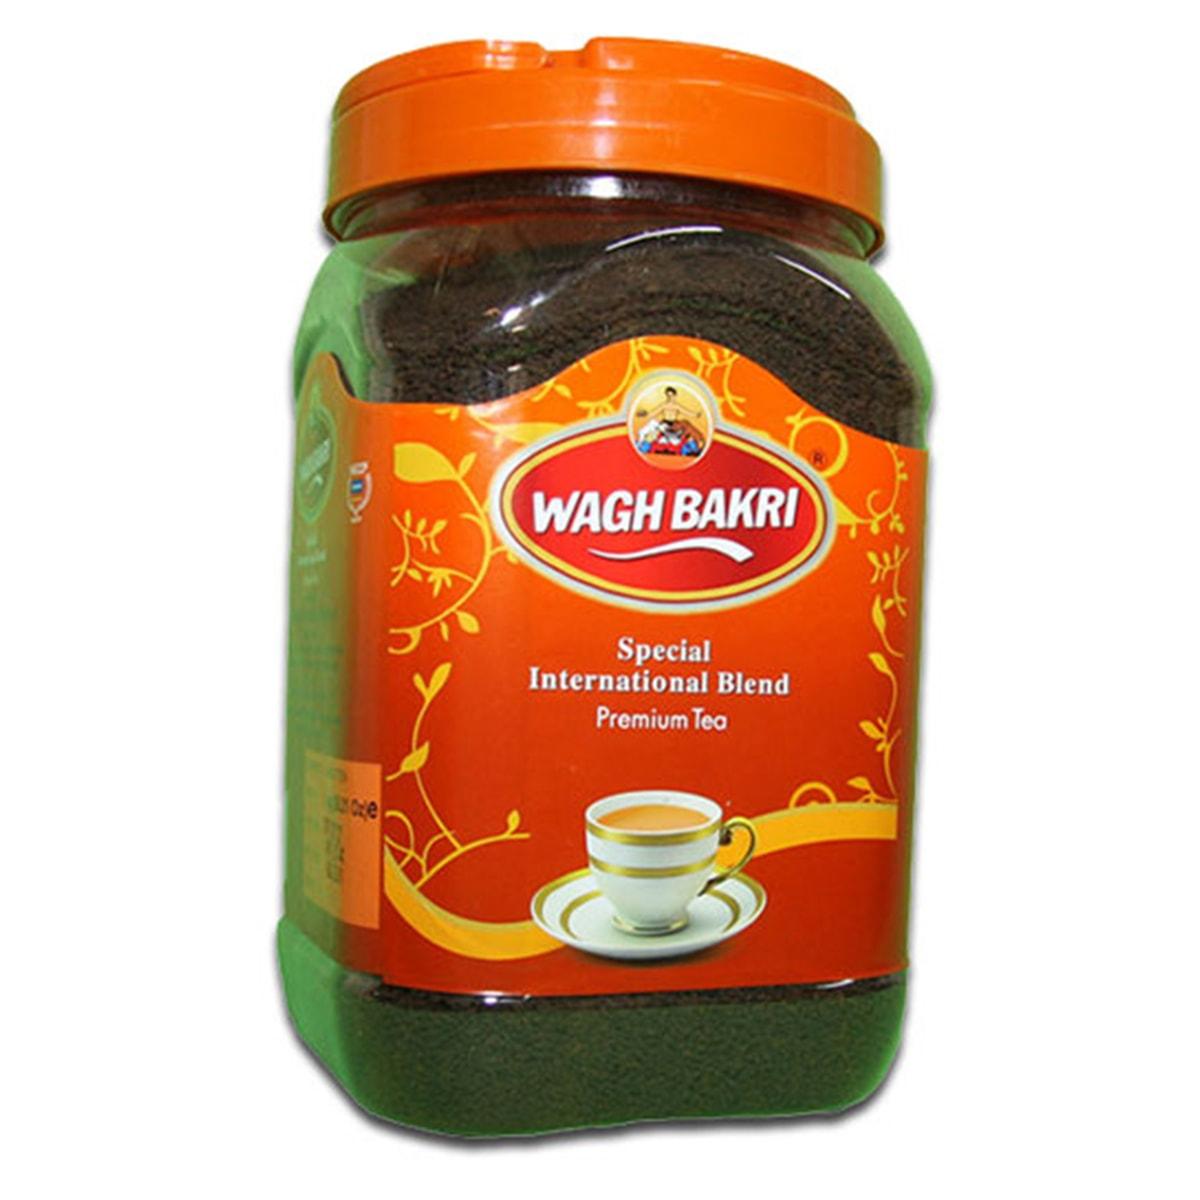 Buy Wagh Bakri Special International Blend Premium Tea Leaf Jar - 1 kg